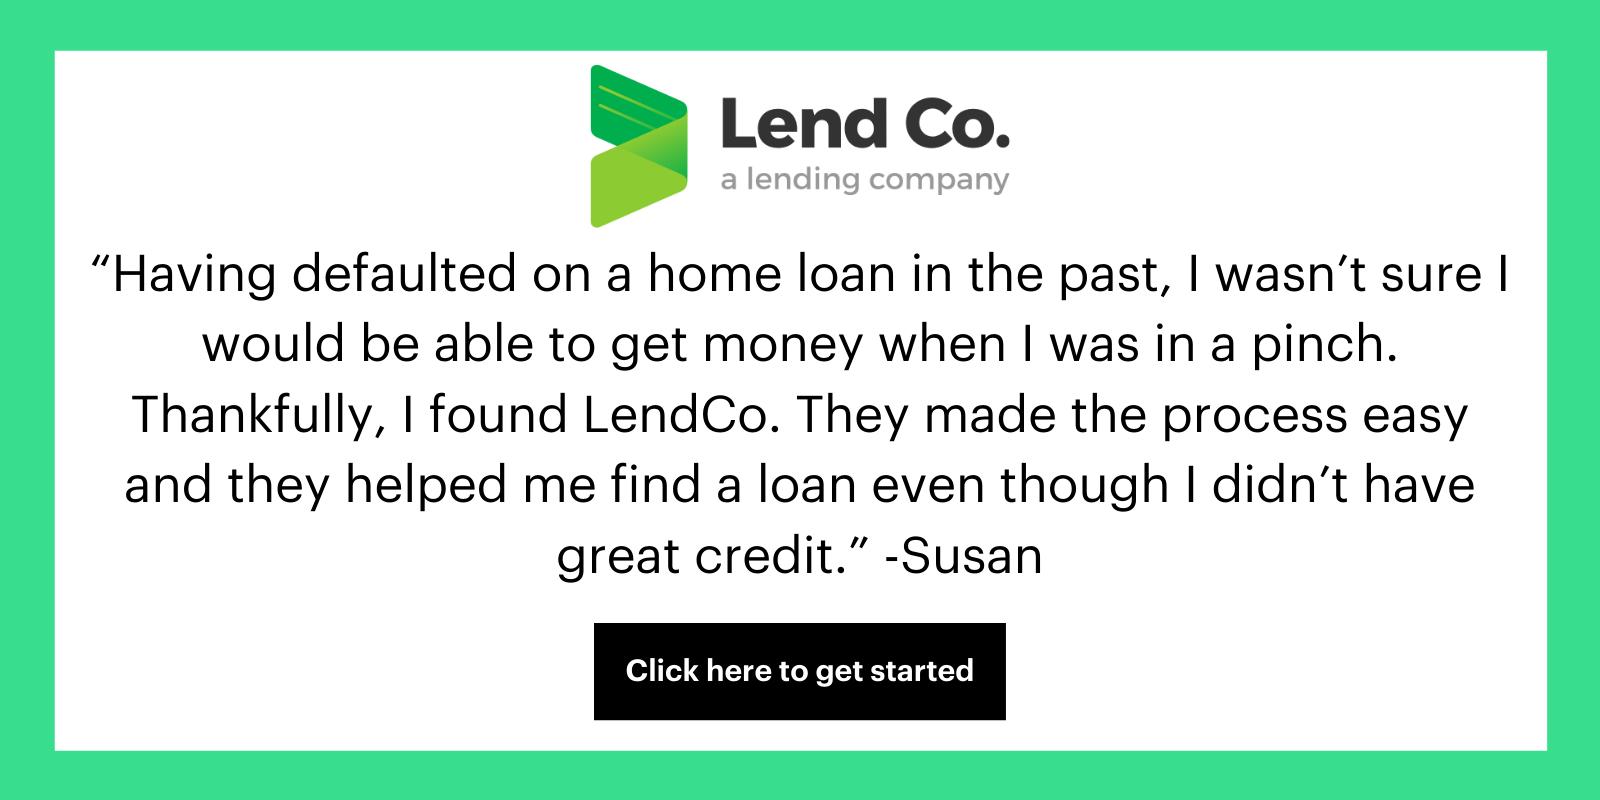 LendCo Testimonial